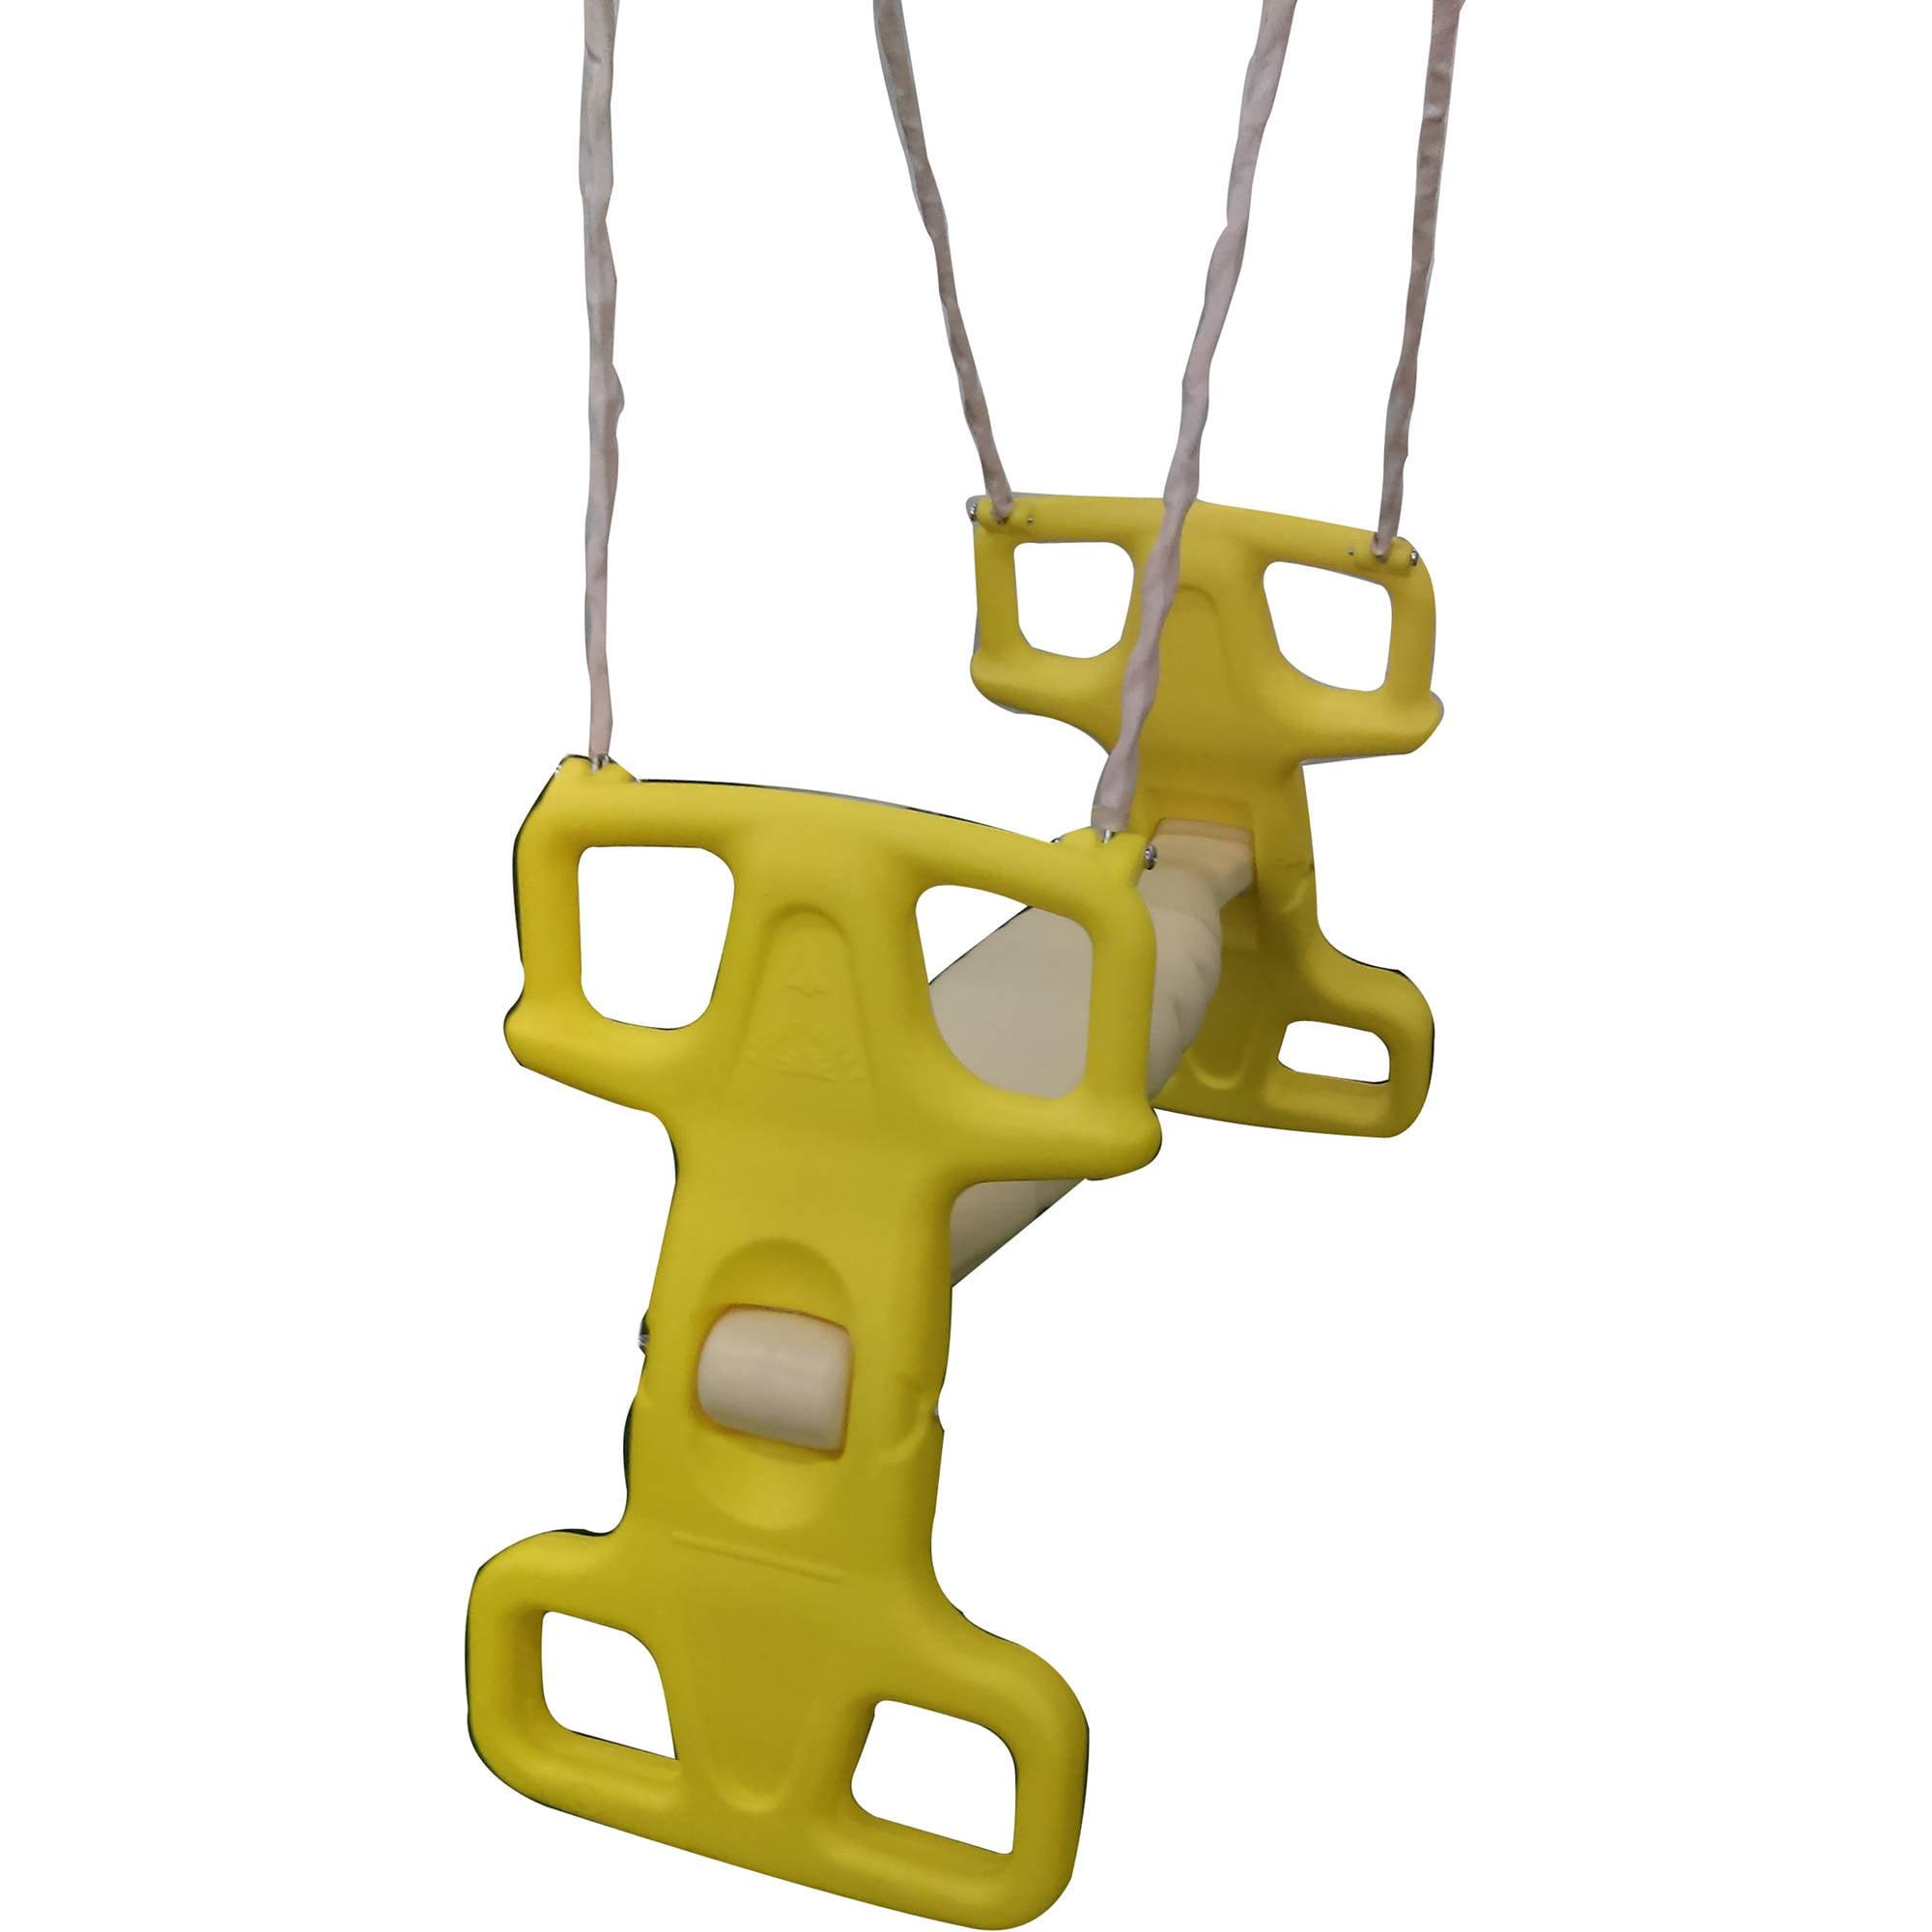 Flexible Flyer Yellow Rocket Rider Tandem Swing Assembly